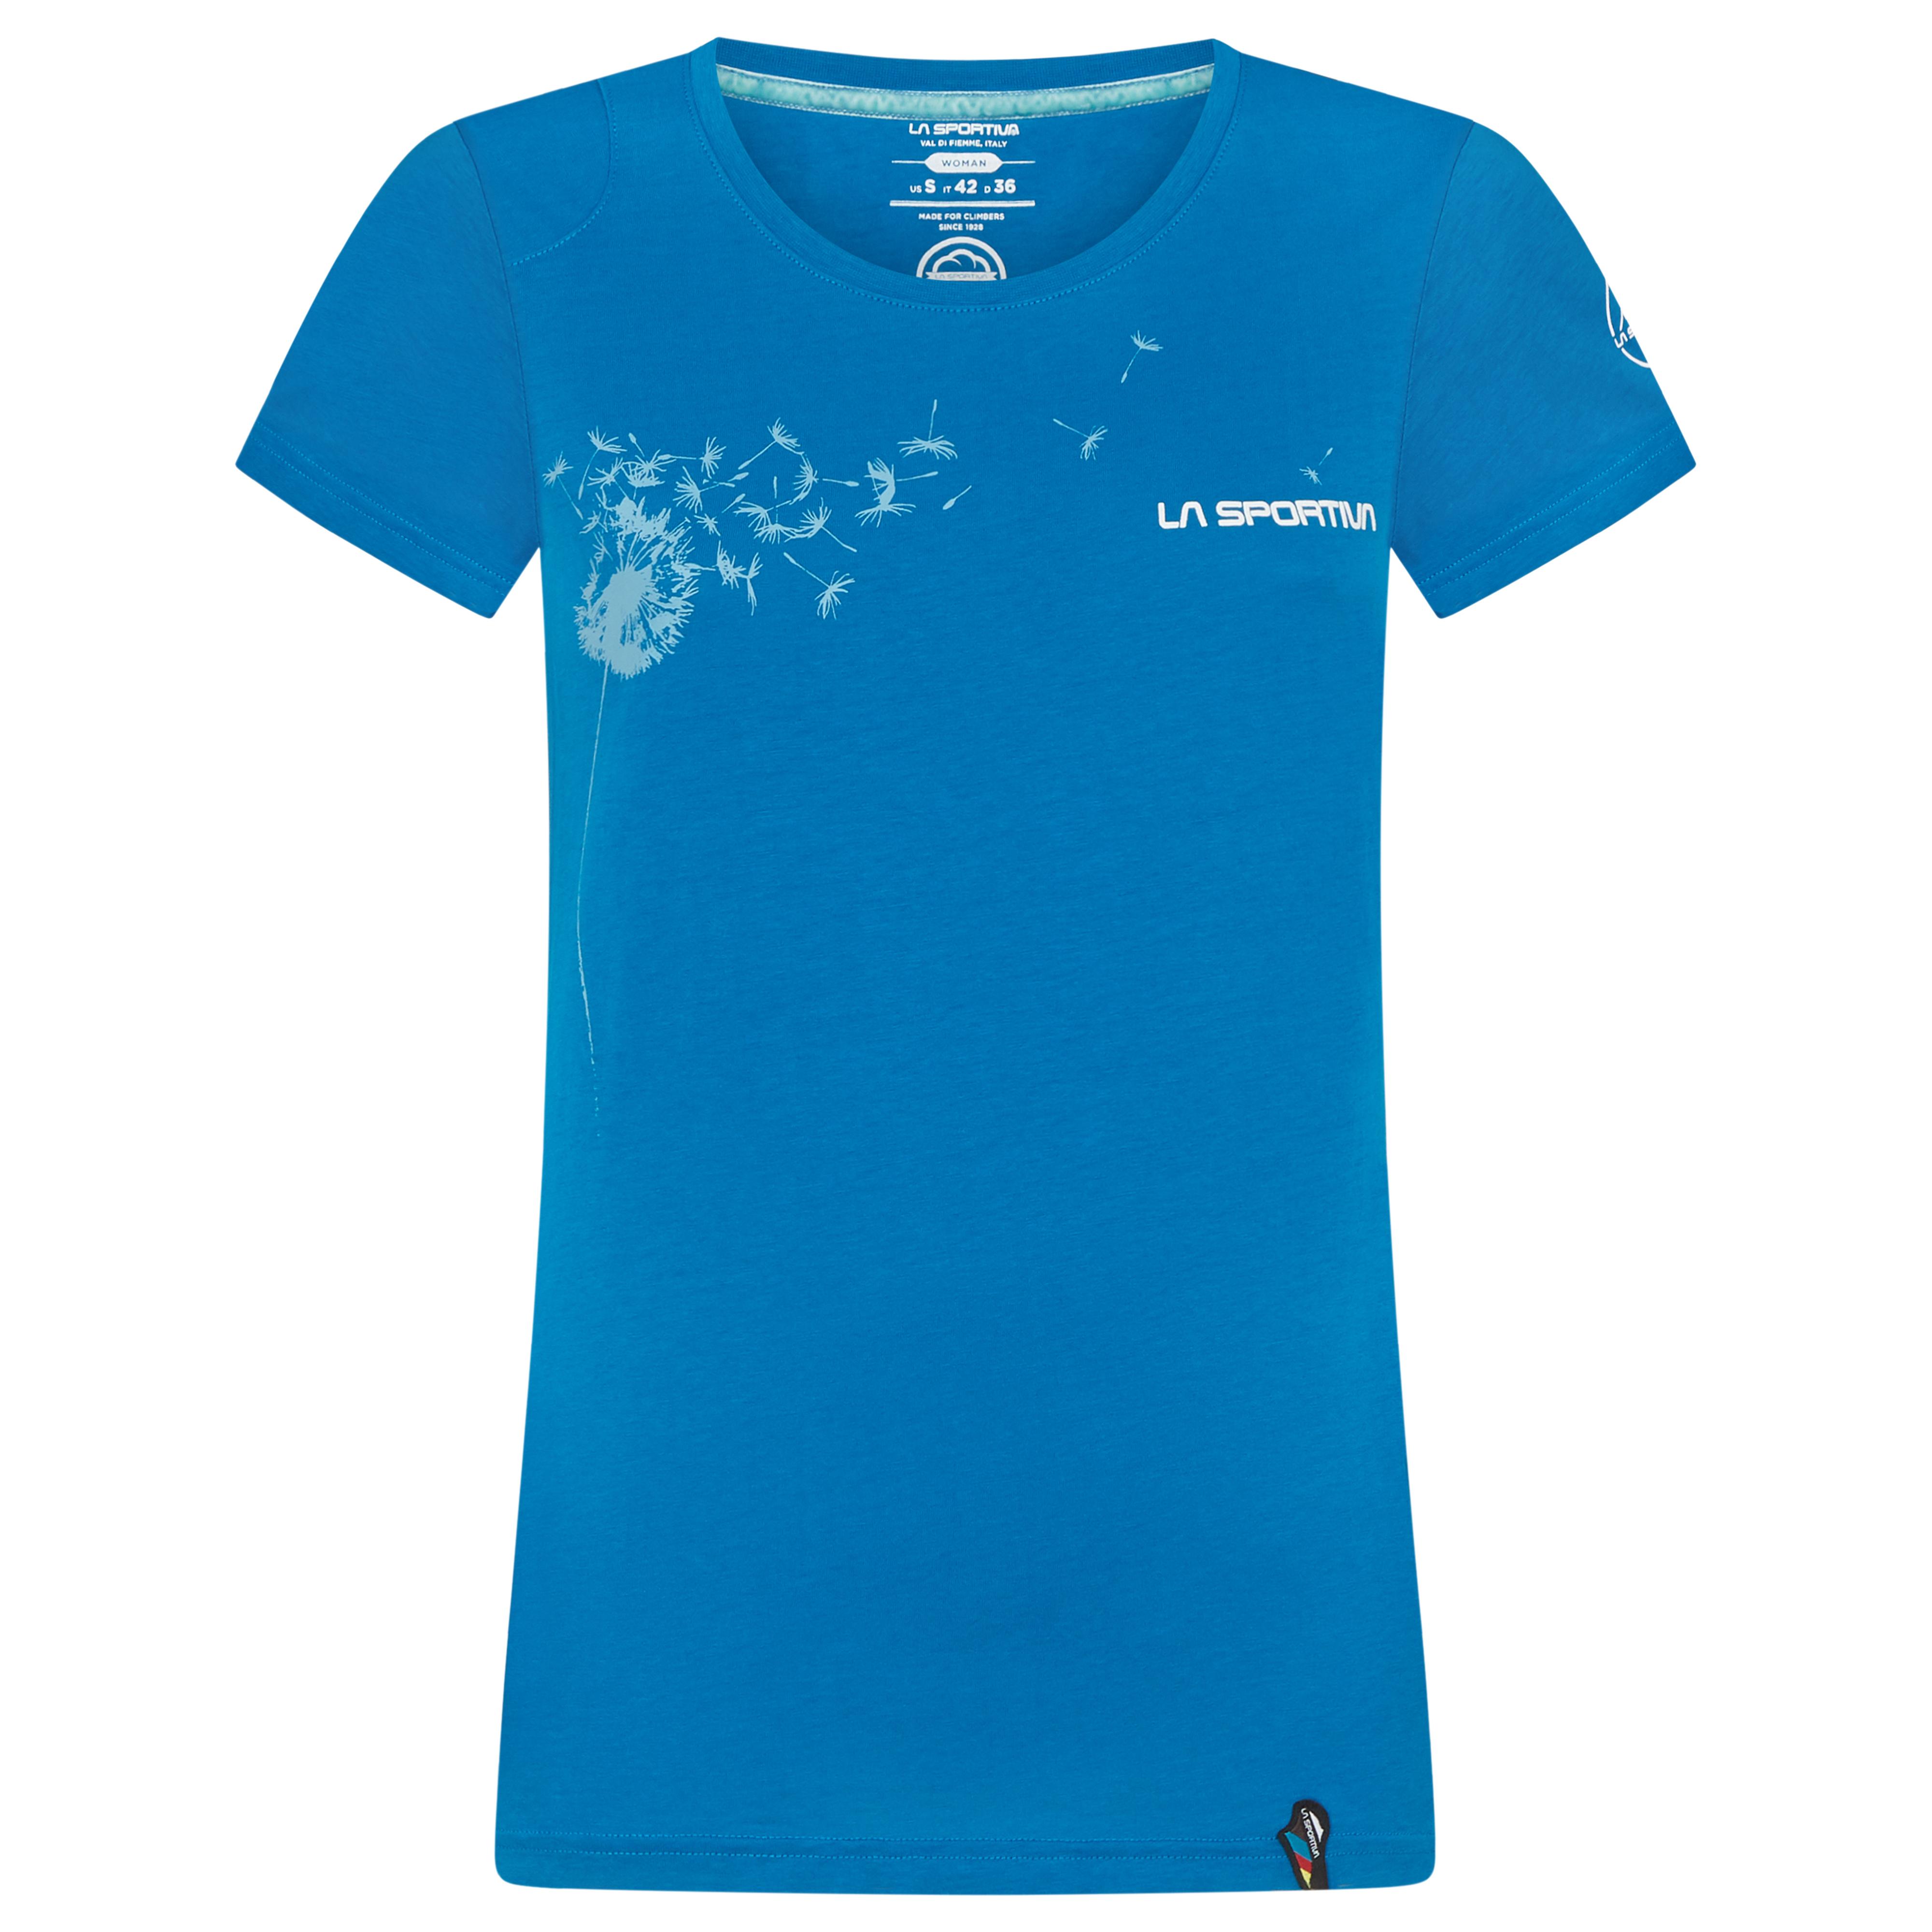 LasportivaWindyLogoshirt